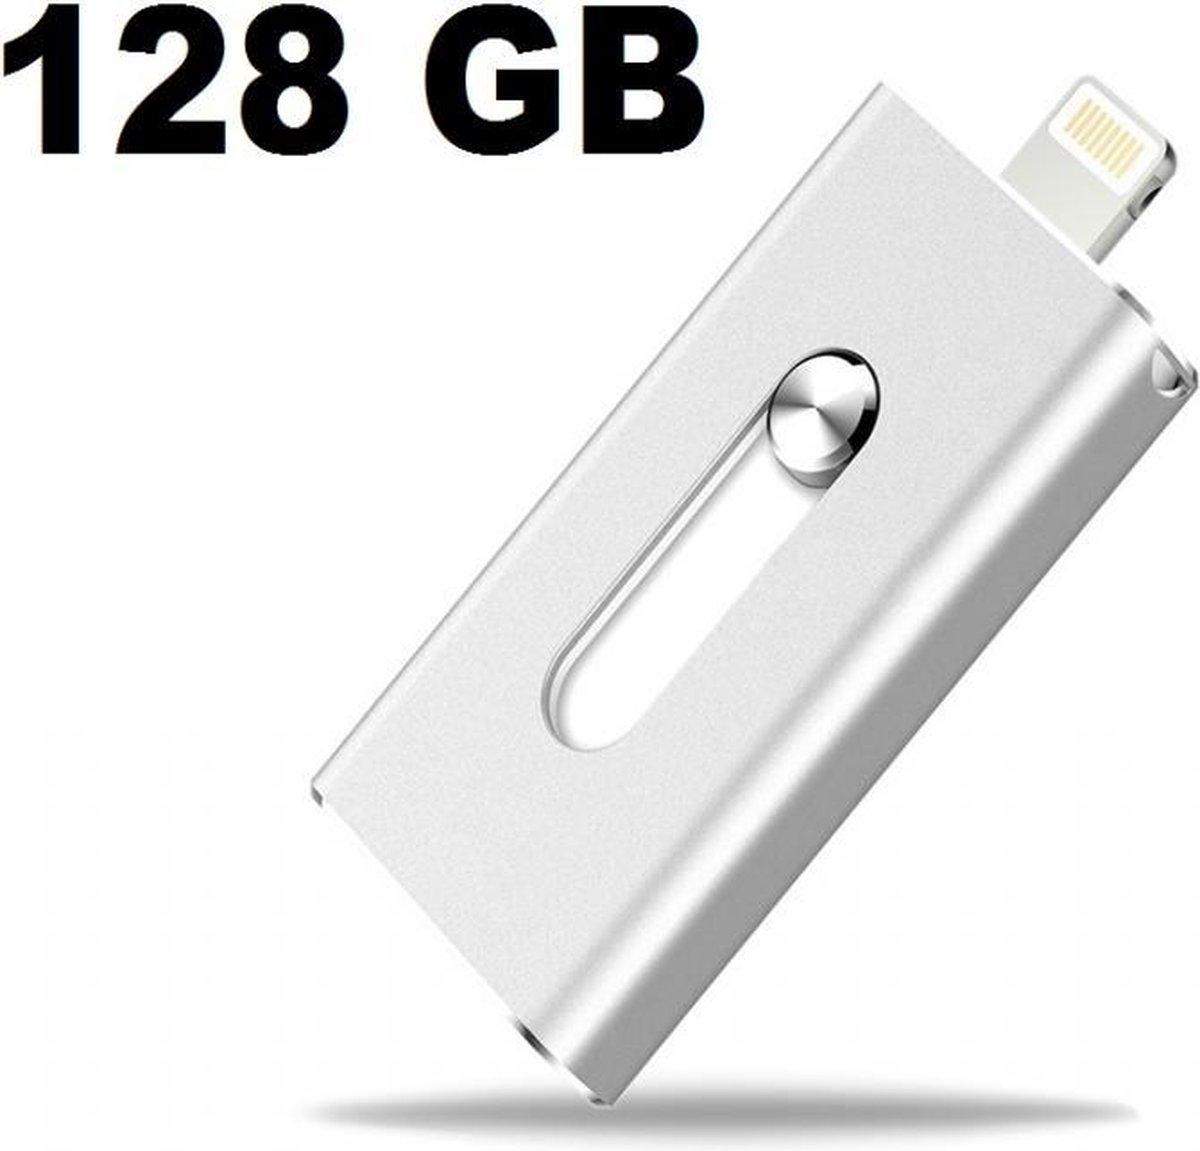 Flashdrive 128GB voor Apple/IOS lightning connector. Flash Drive 128GB USB stick ( iphone / ipod / ipad air 1,2,3, pro, mini)